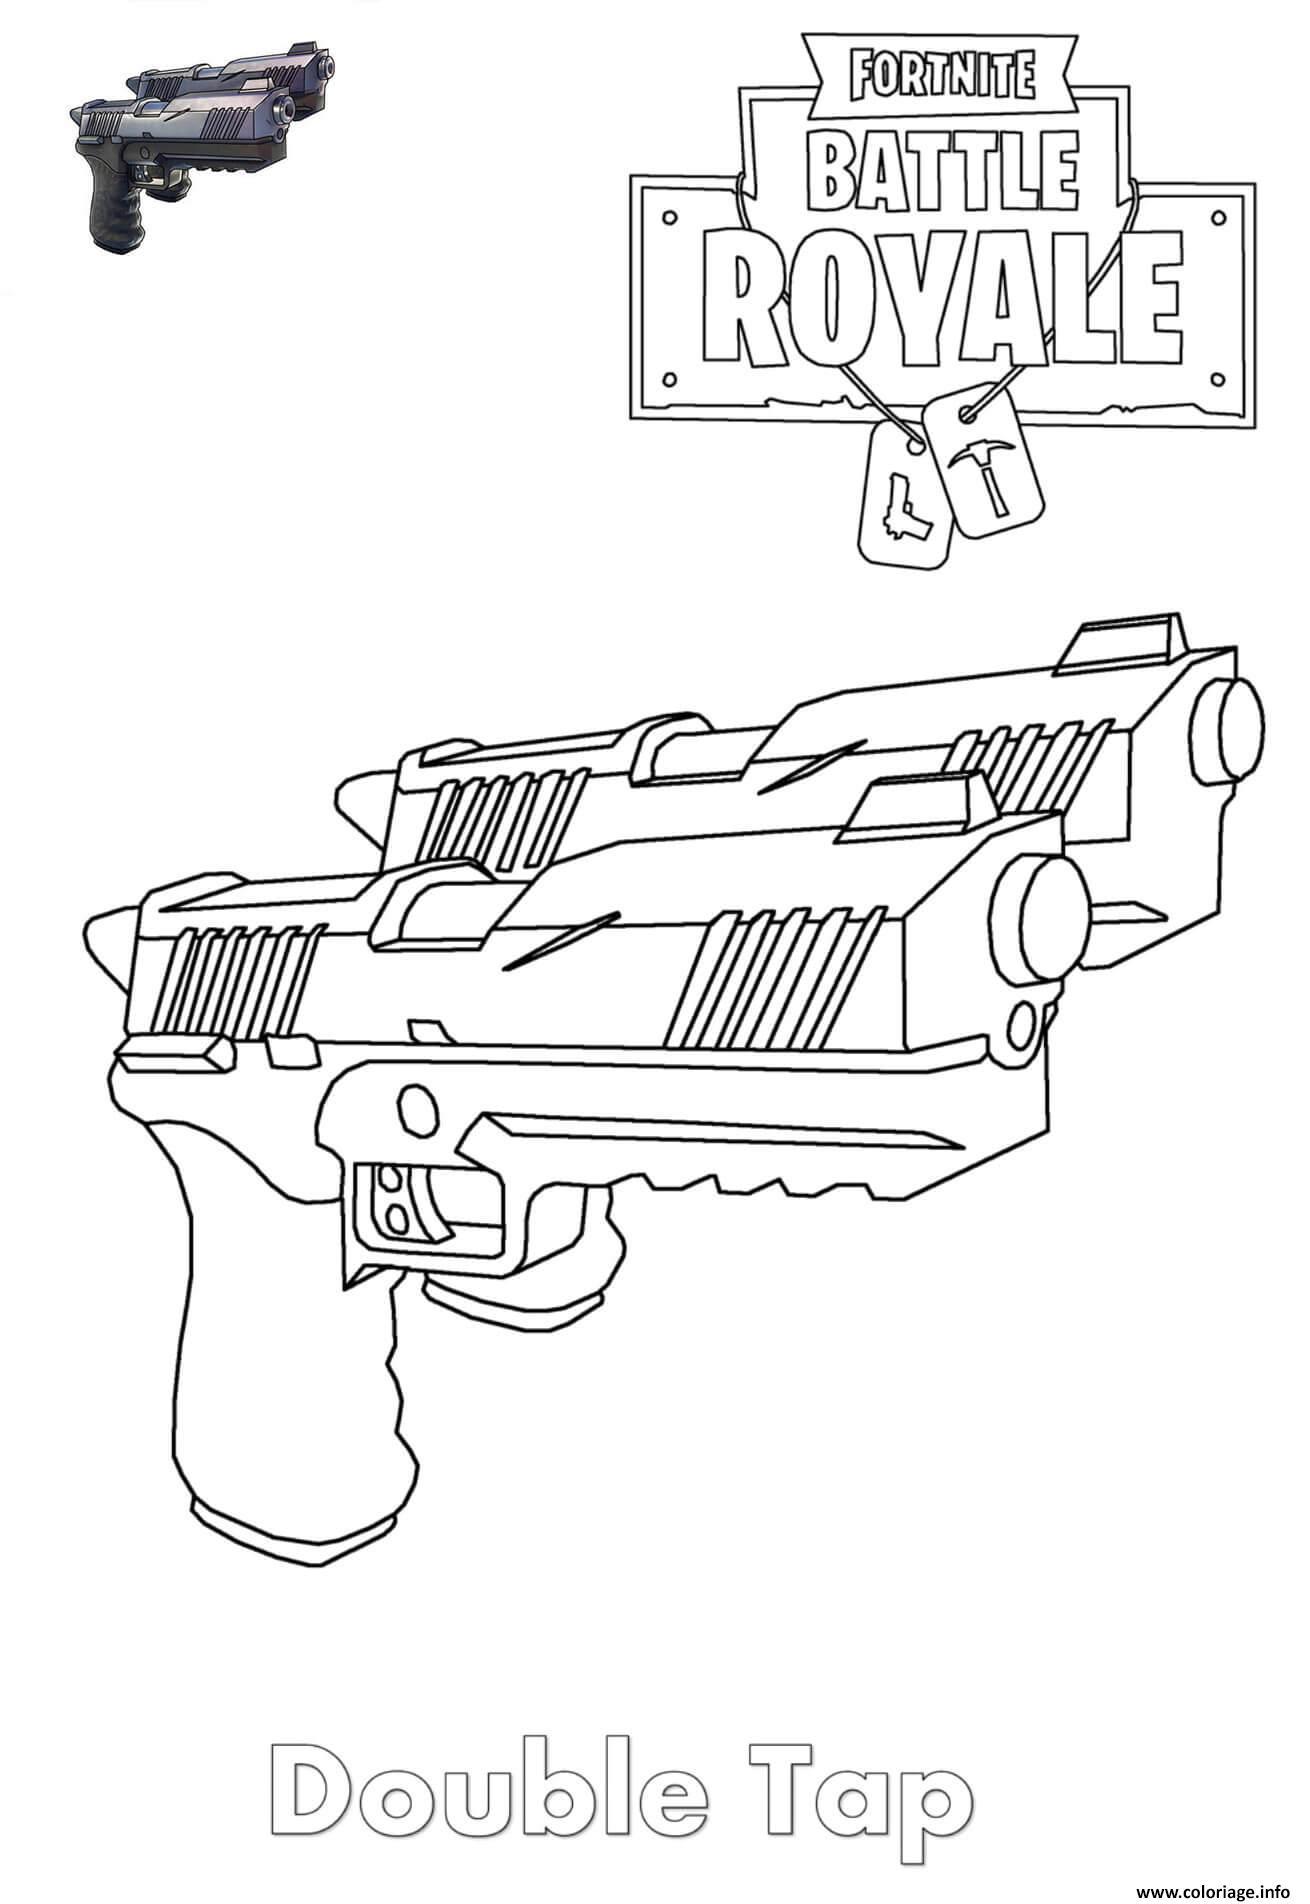 Fortnite Rifle Scar Coloring Page Imprimer en 2019 Coloriage